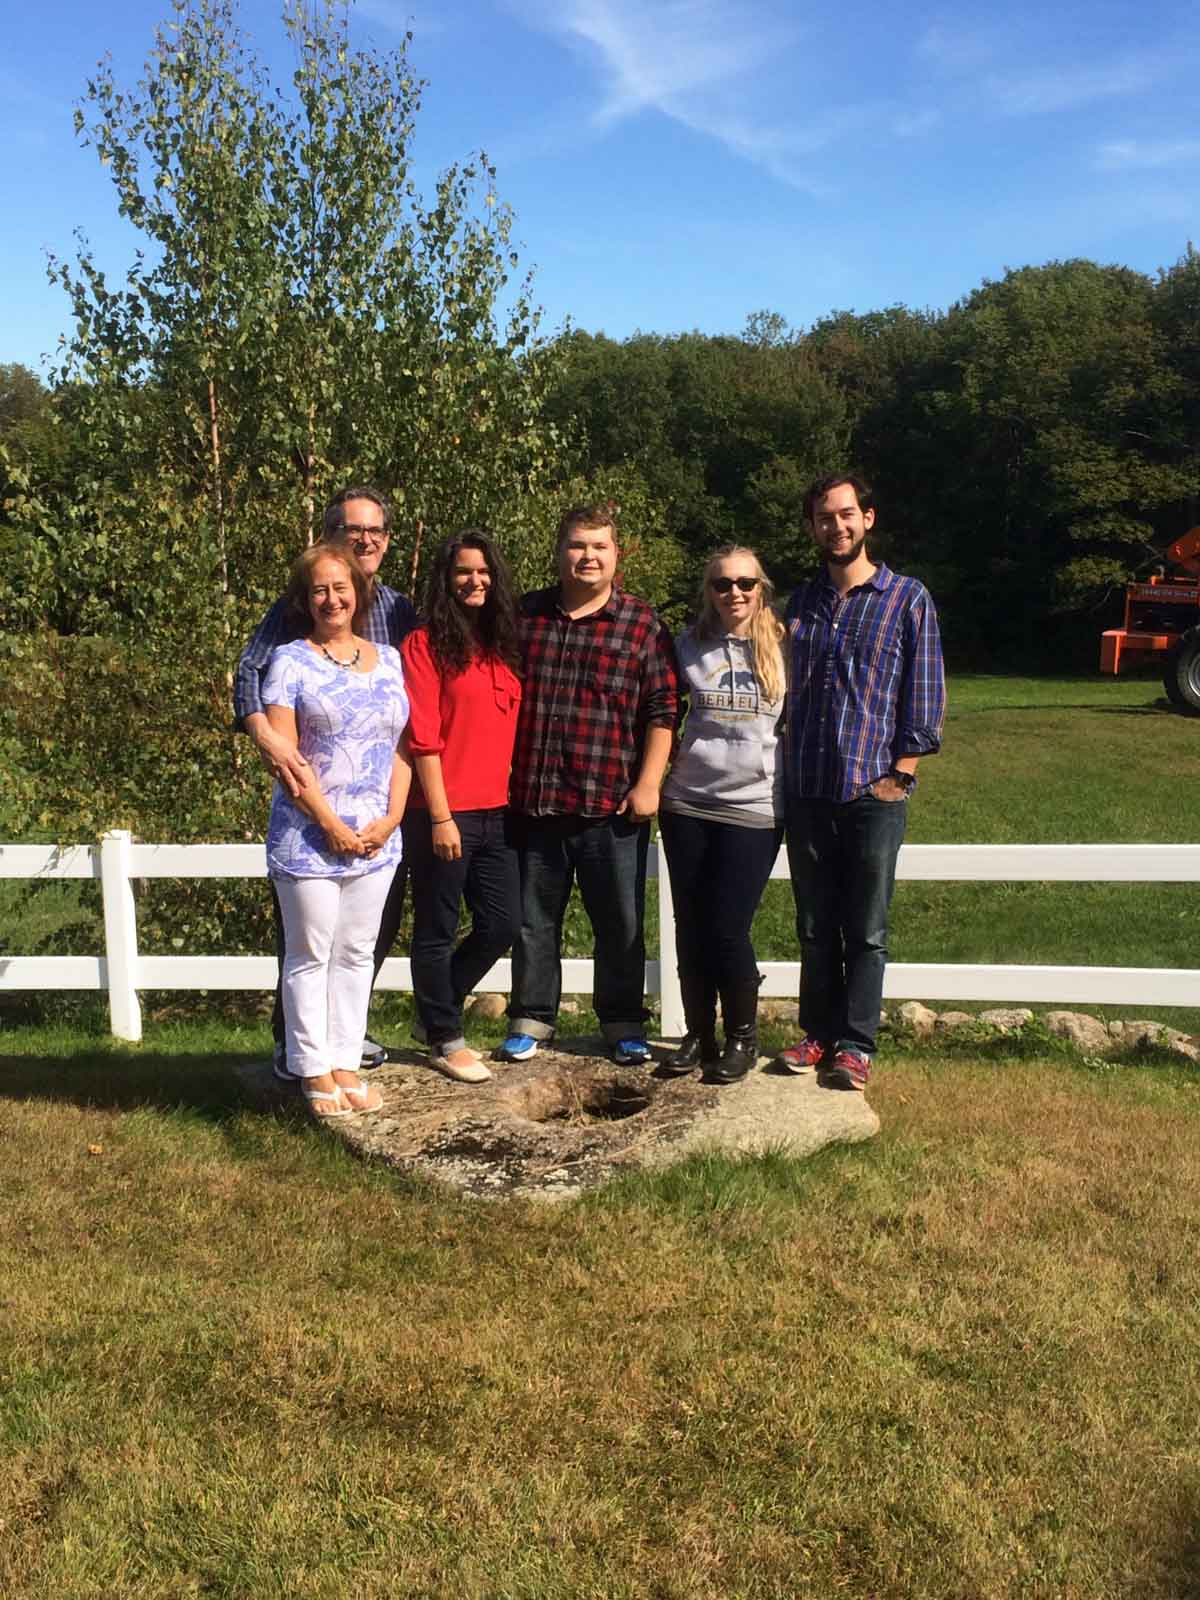 Familiy New Hampshire Apple Picking